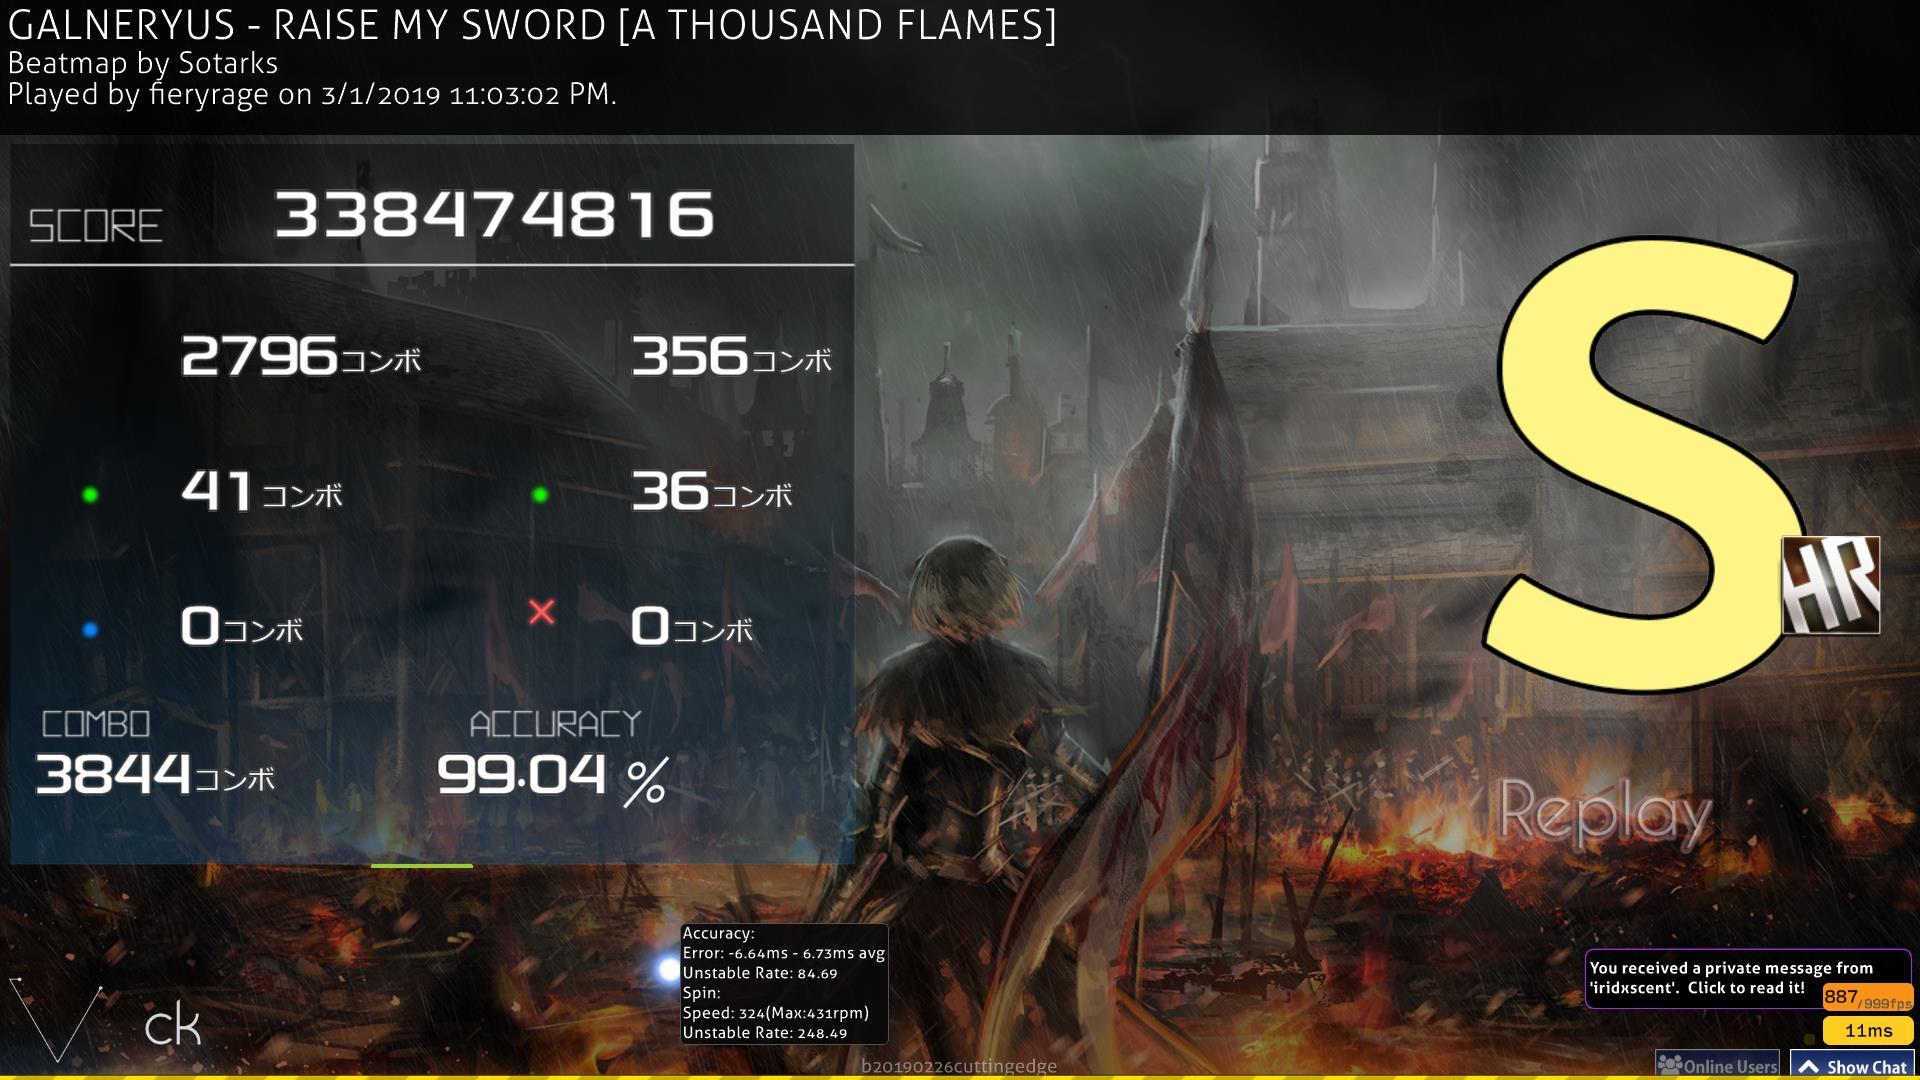 fieryrage | GALNERYUS - RAISE MY SWORD [A THOUSAND FLAMES] (Sotarks